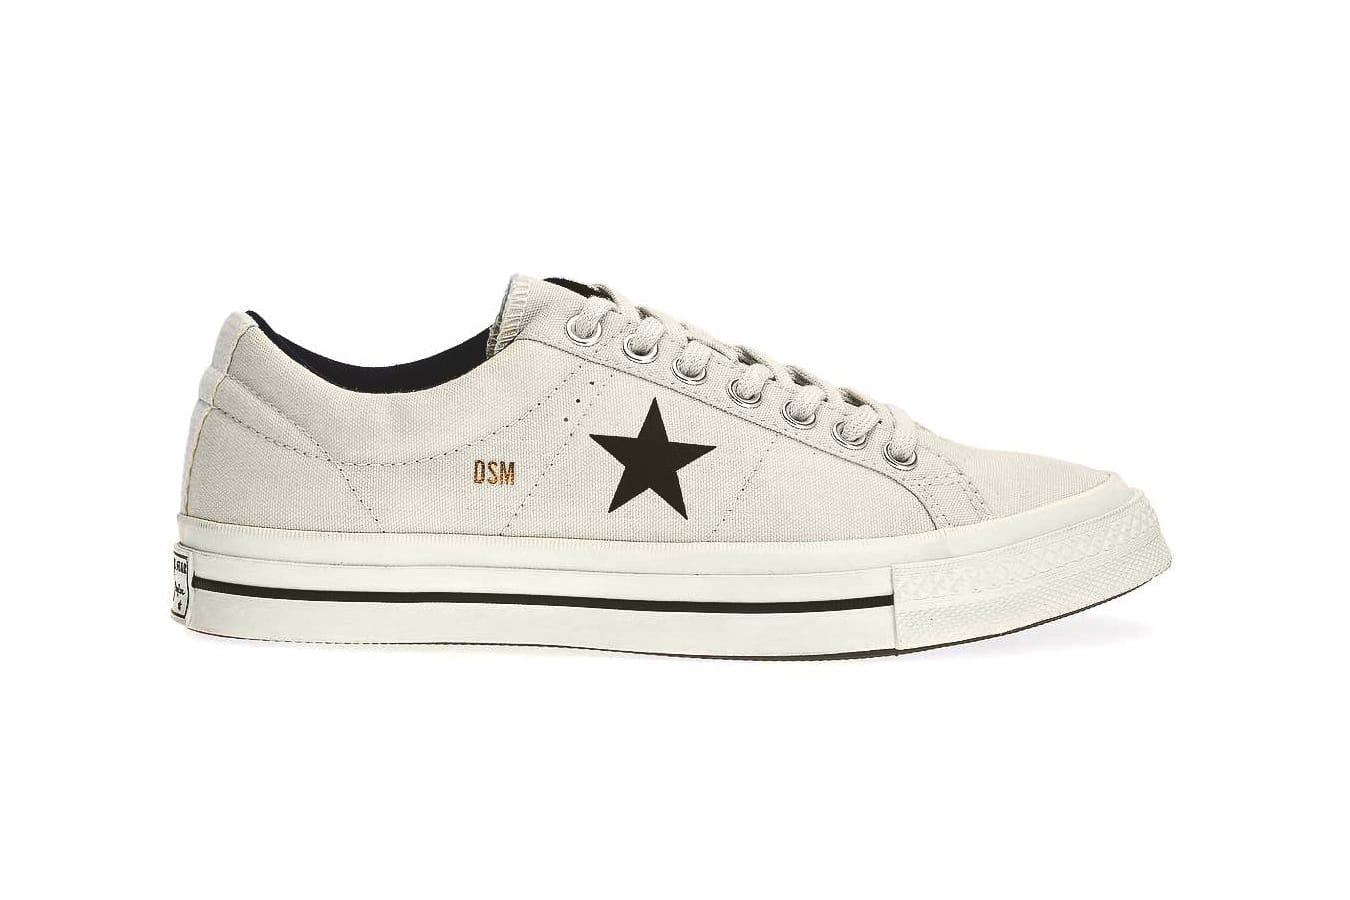 Dover Street Market x Converse One Star